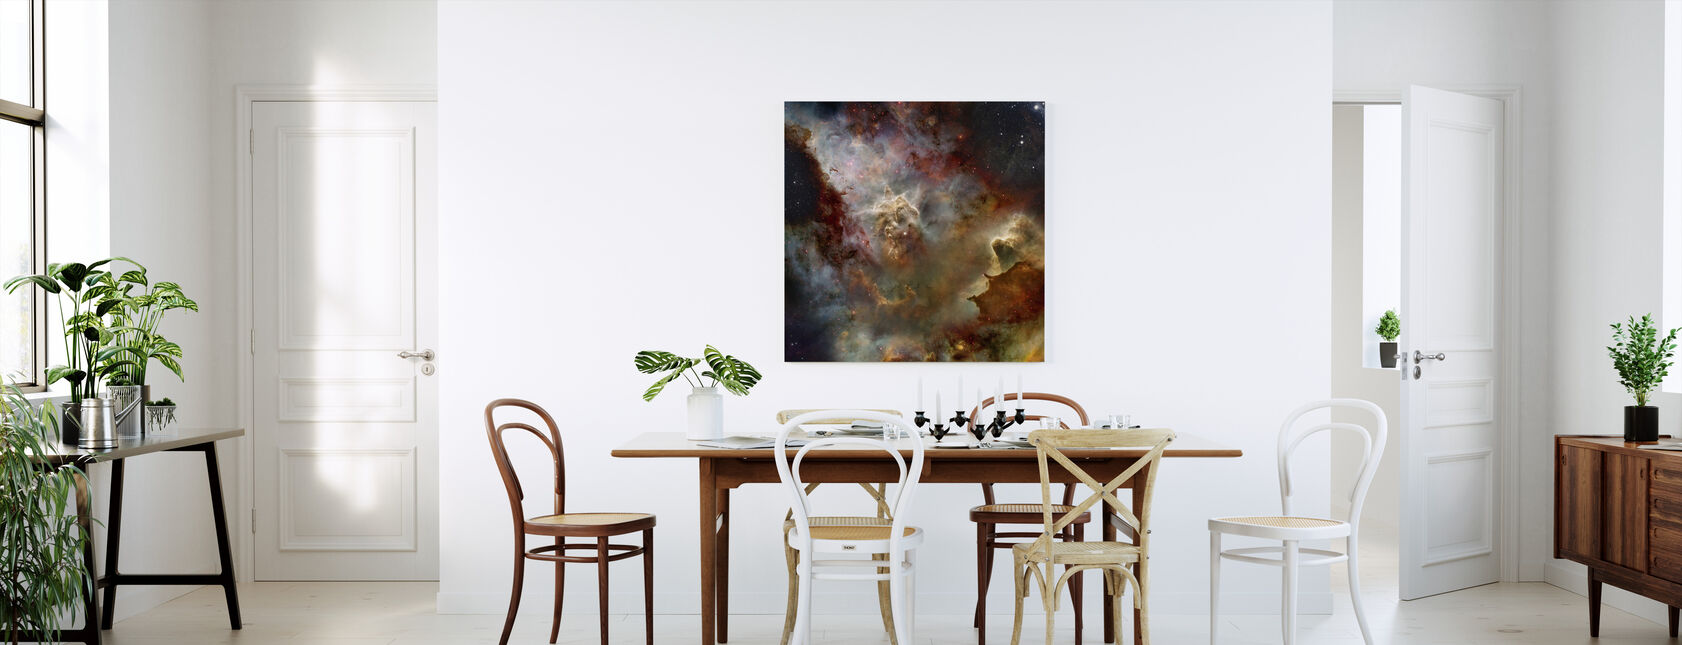 Astronomi og rum